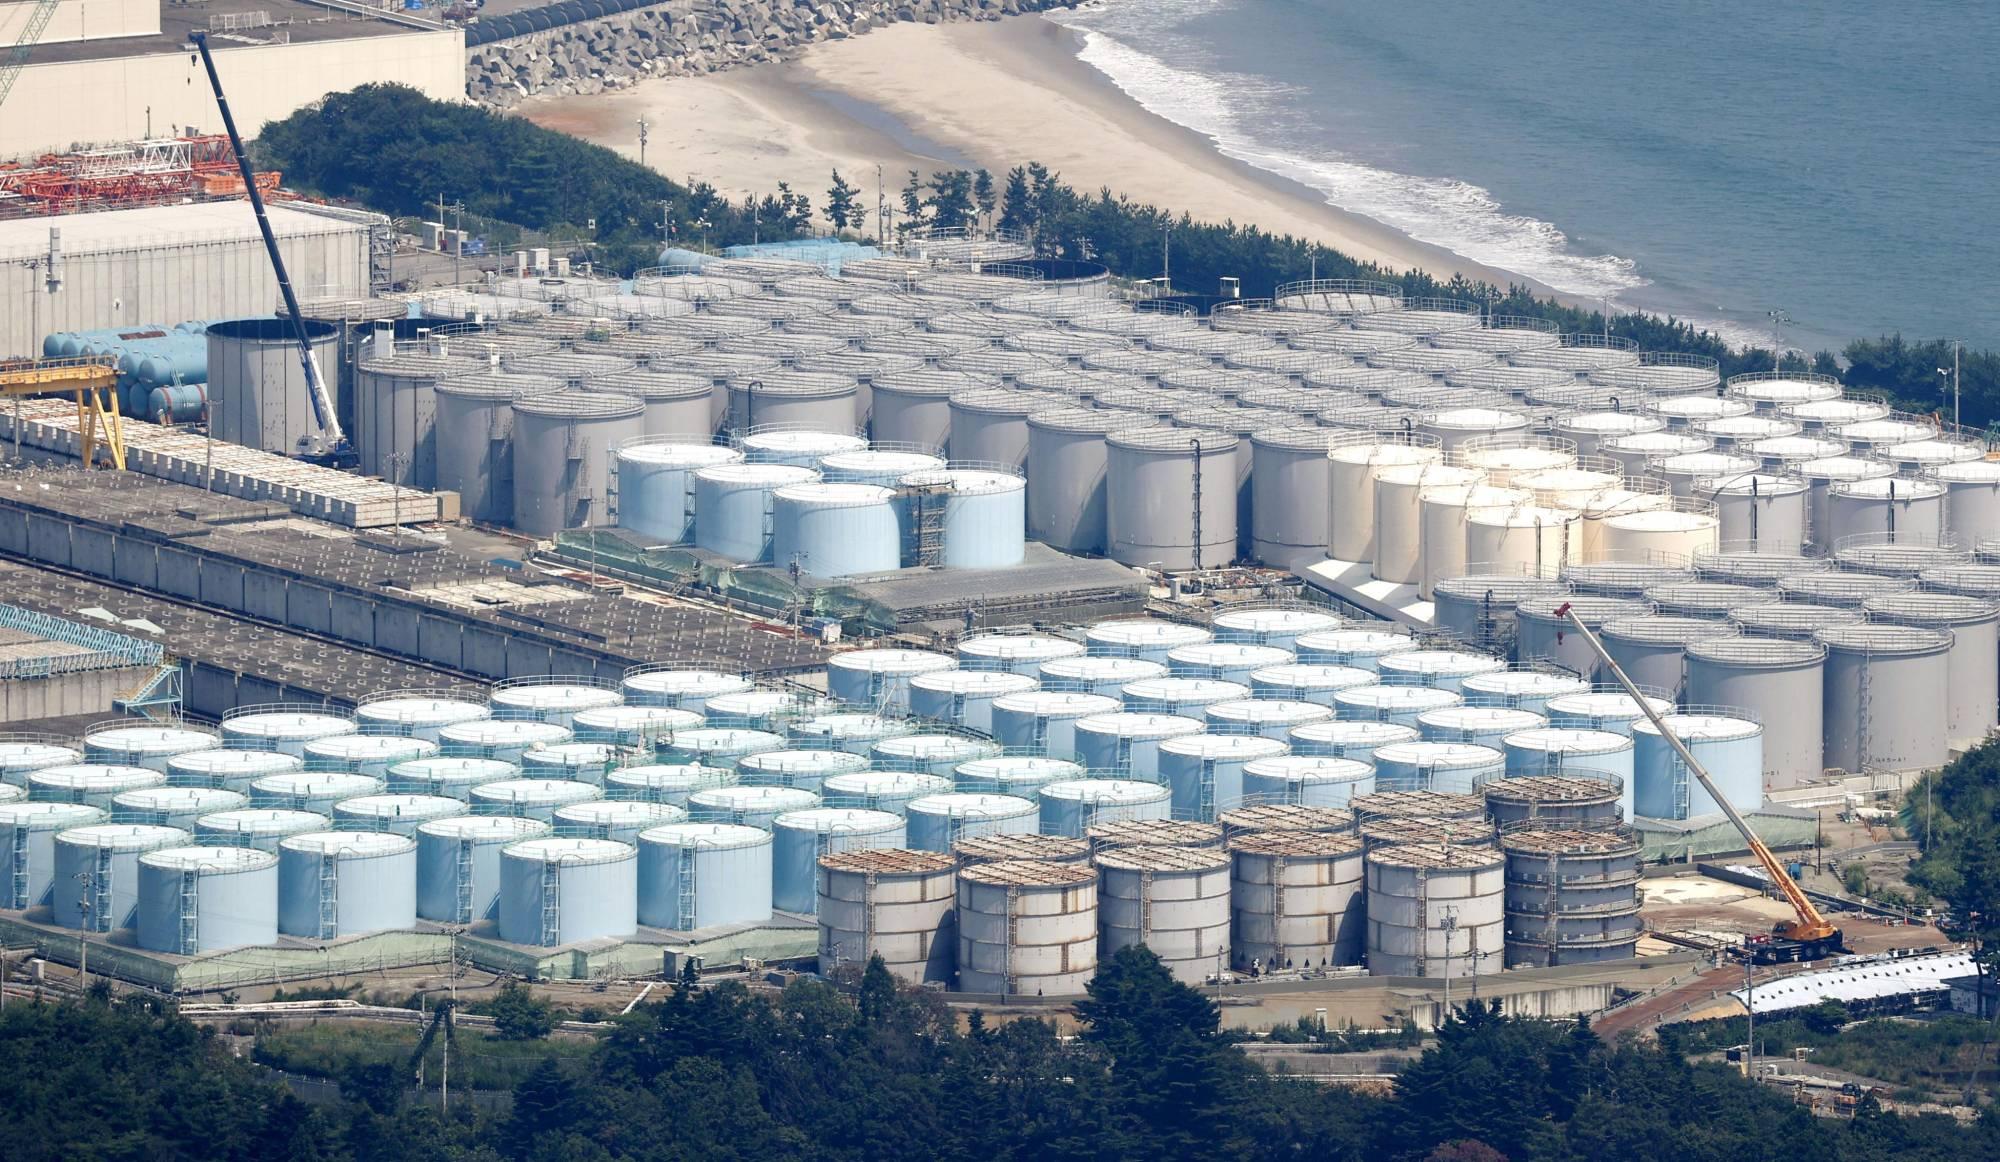 Nucleare, Fukushima, giappone, trizio, acqua, radioattivo, ambiente, EnergyCuE